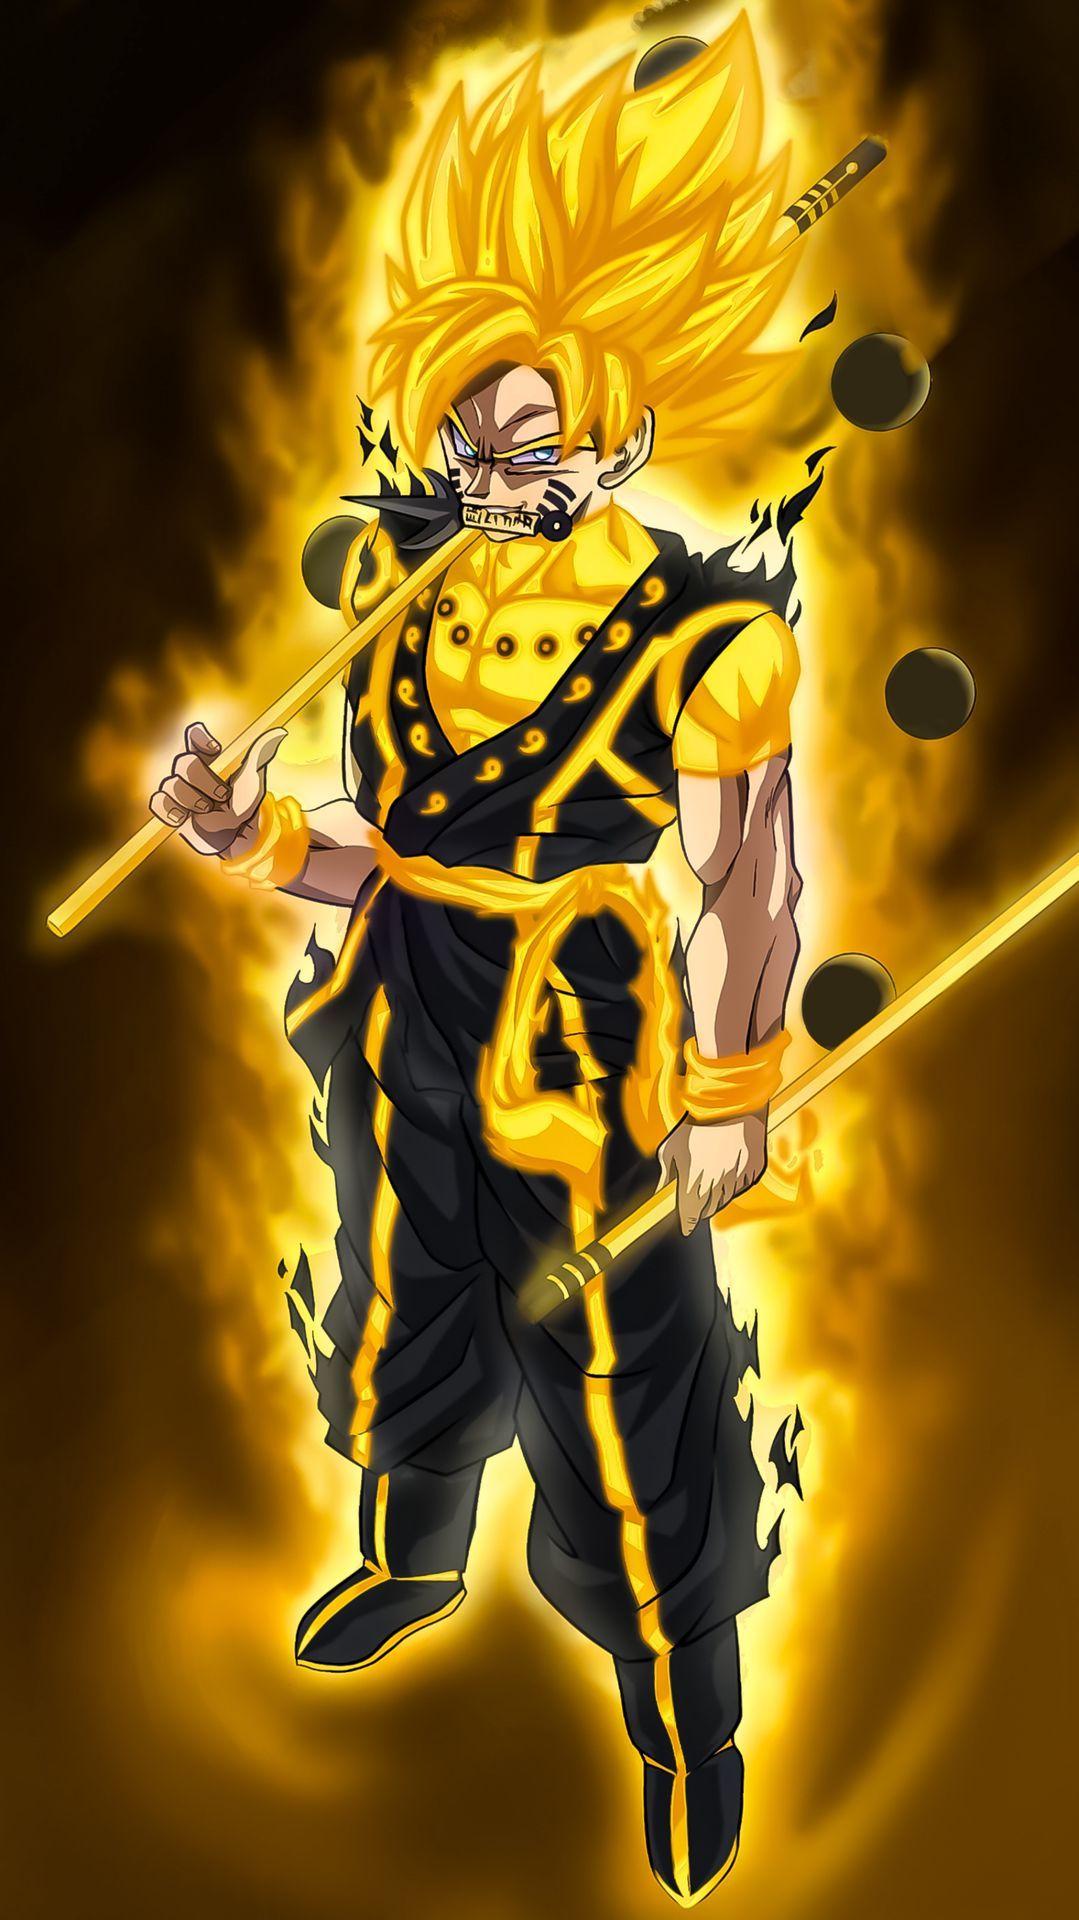 Son Goku Goku E Naruto Personagens De Anime Wallpaper Do Goku